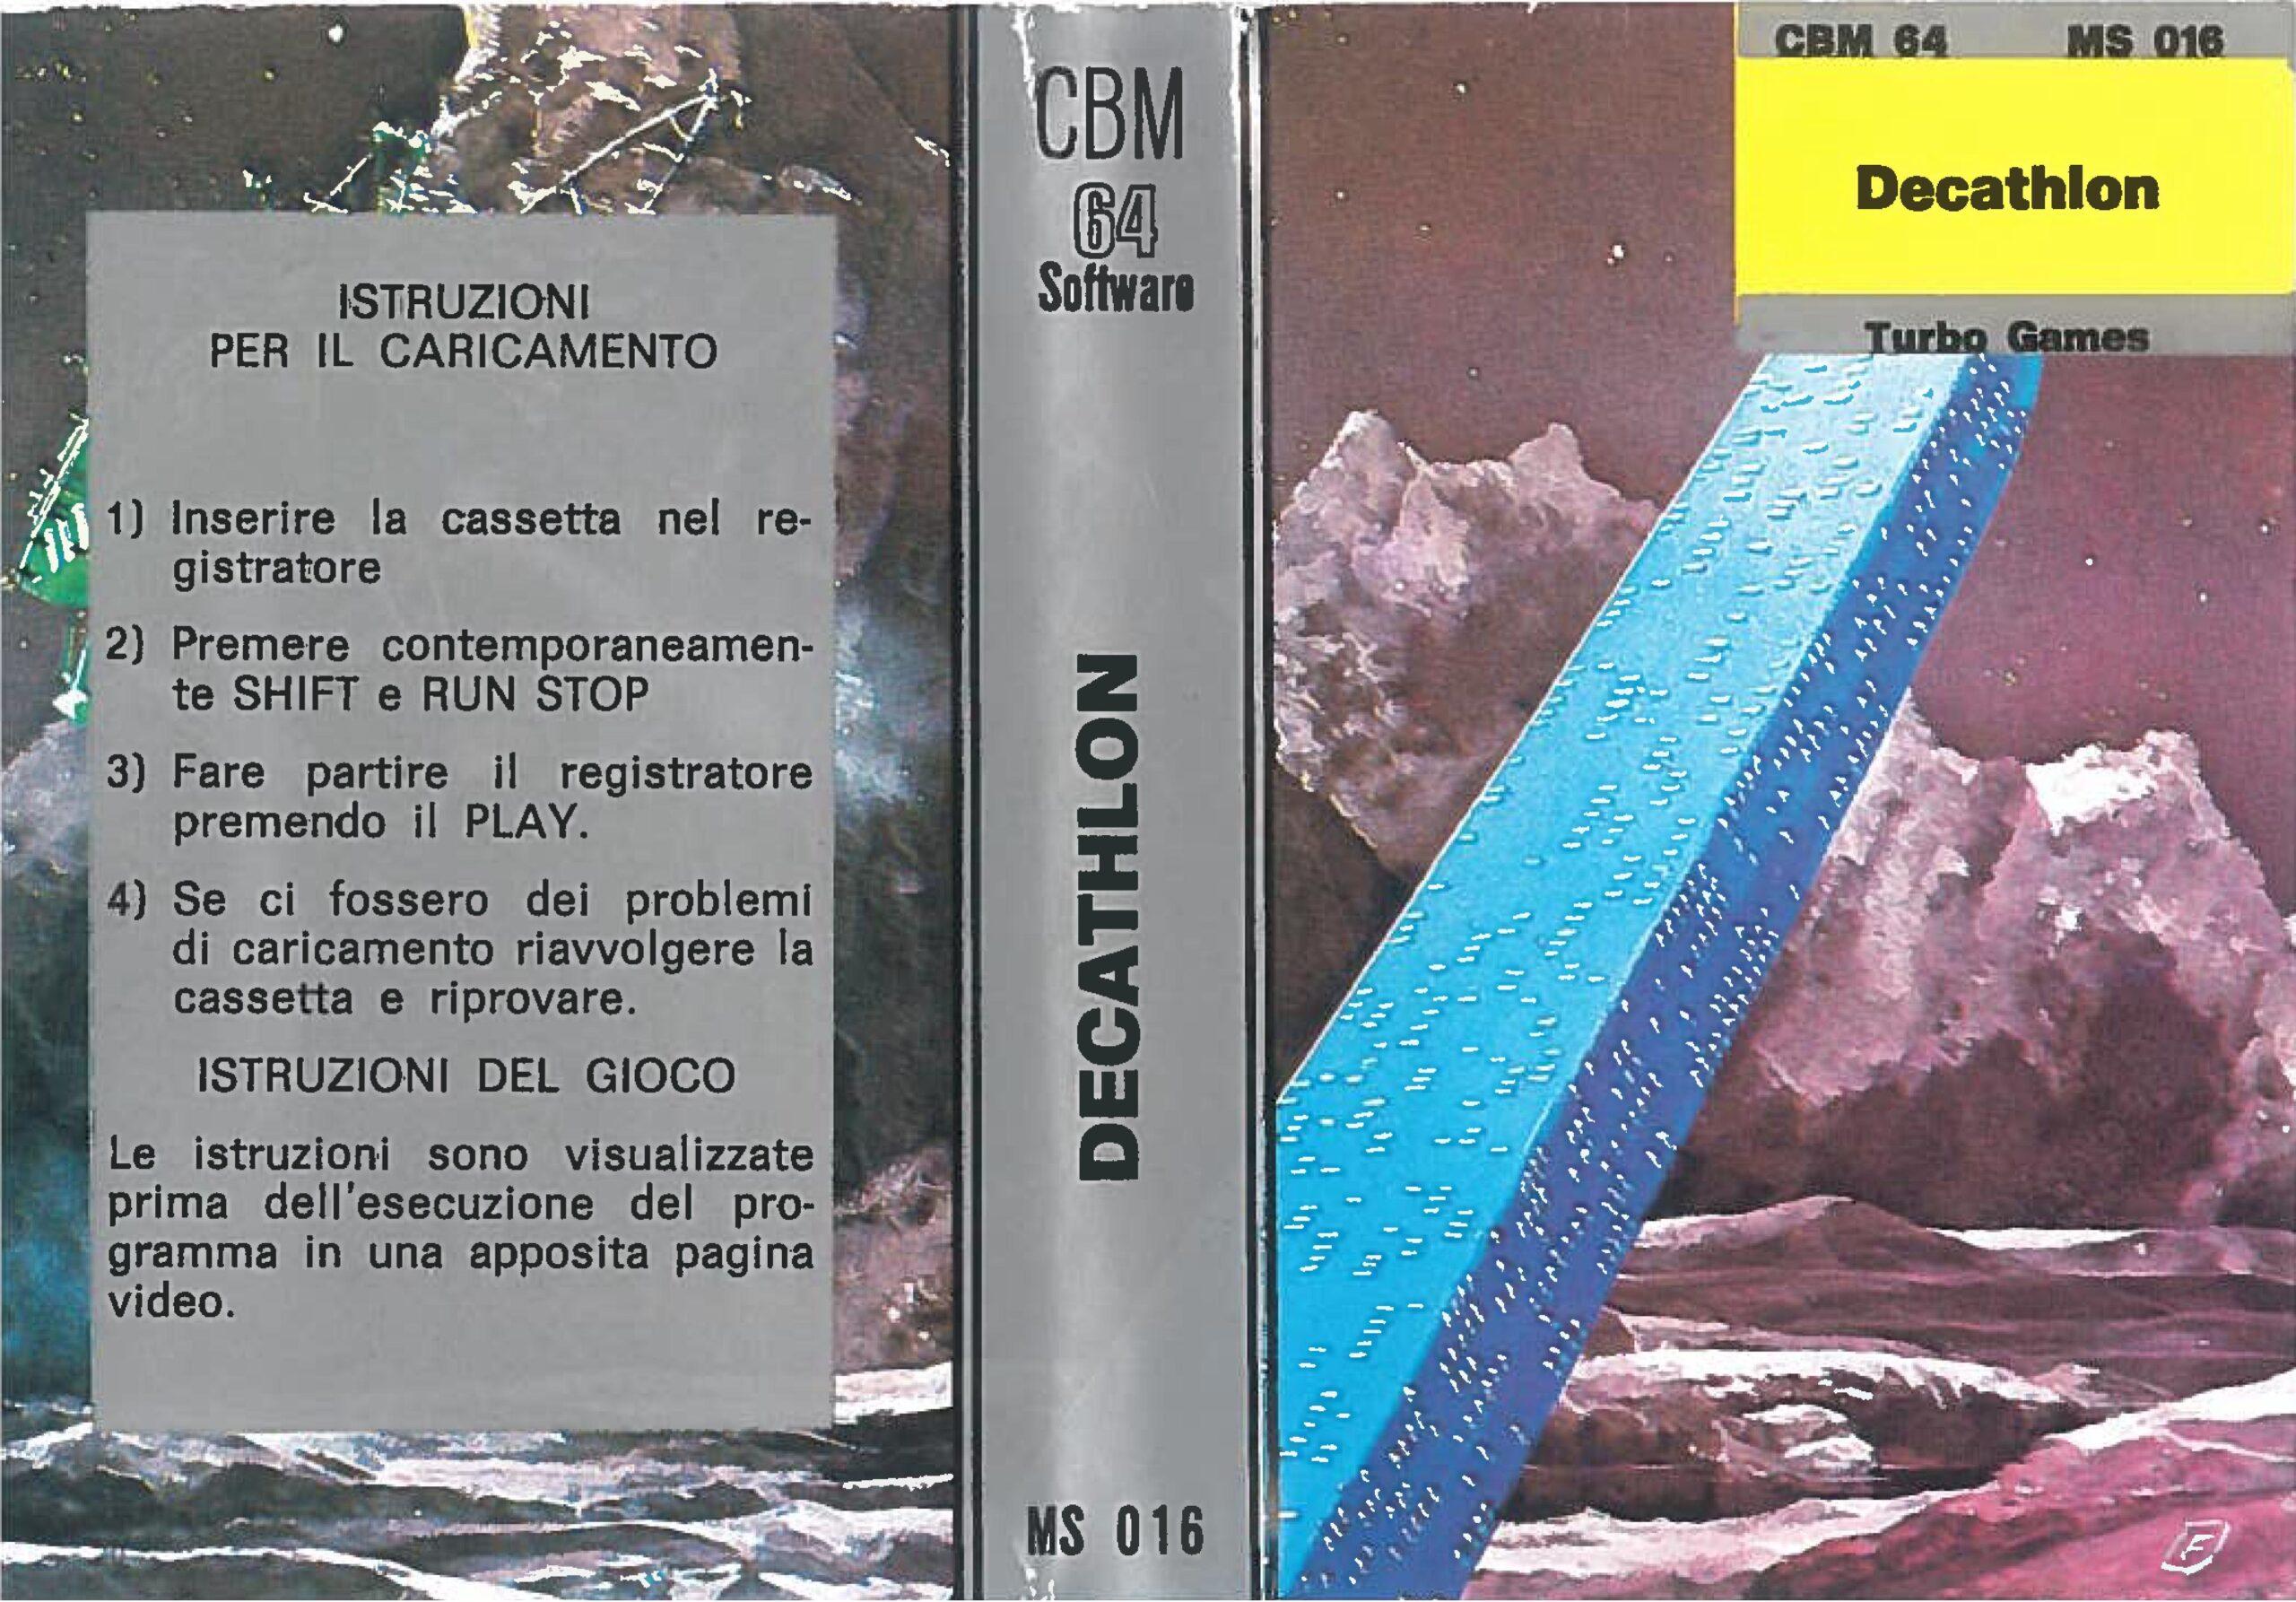 DECATHLON MS 016